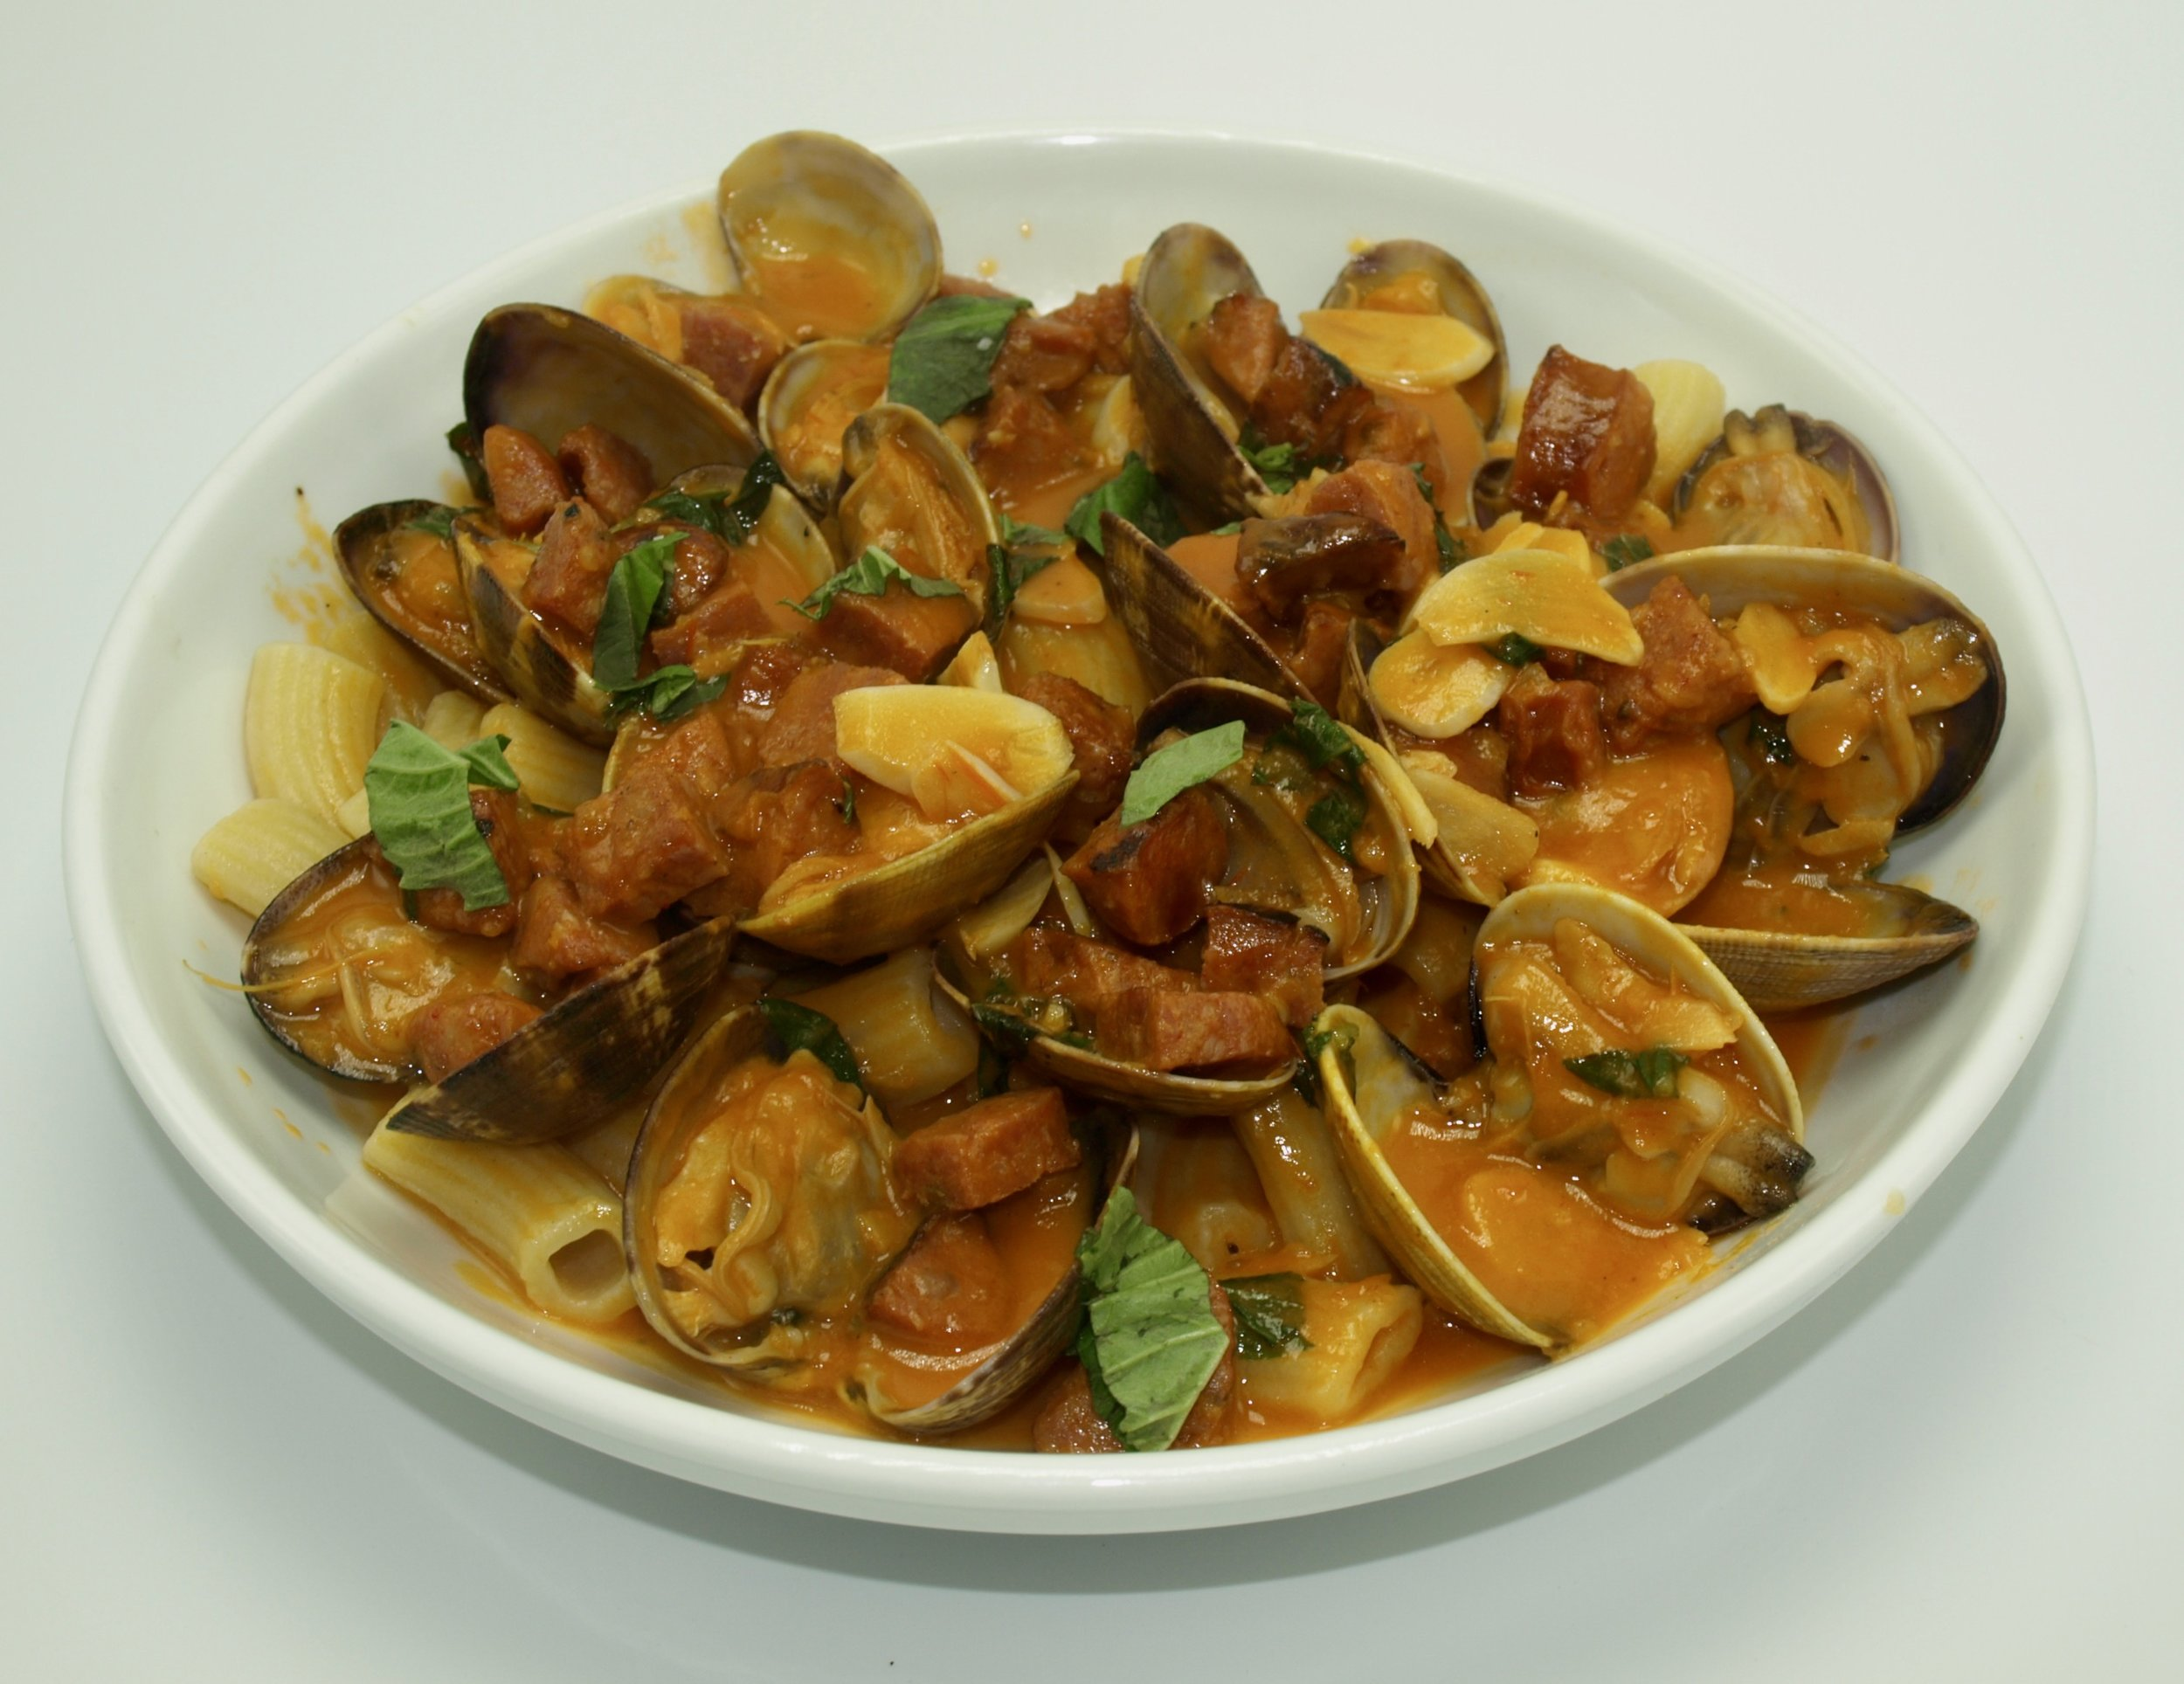 Some Foodie favorites from Piccolo Mondo include: Rigatoni with Manila clams, chorizo and tomato-basil brodetto.